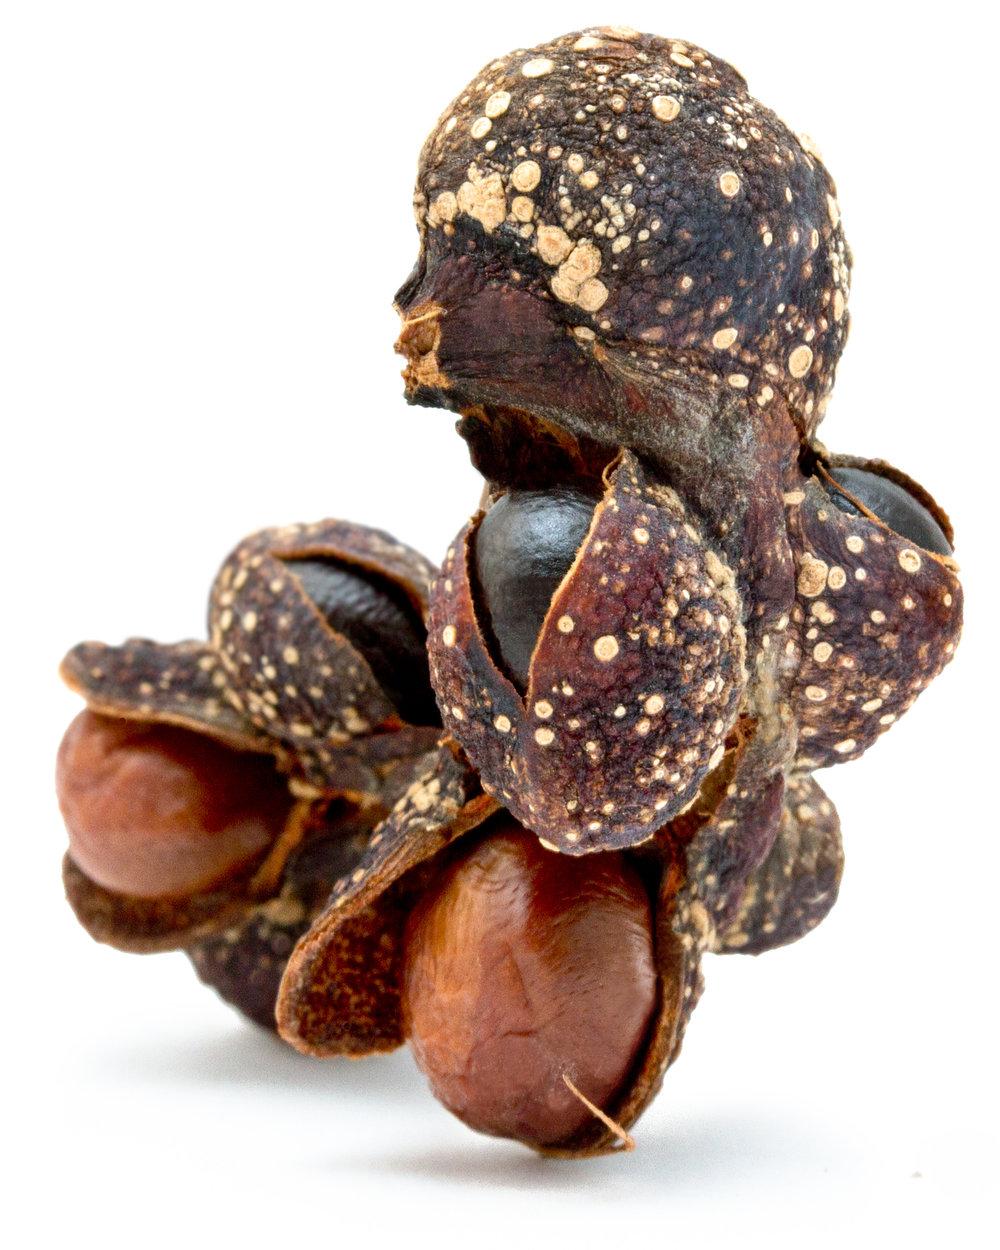 Lily magnolia ( Magnolia liliiflora )  Collected at Arnold Arboretum of Harvard University, Boston, Massachusetts, 2011.